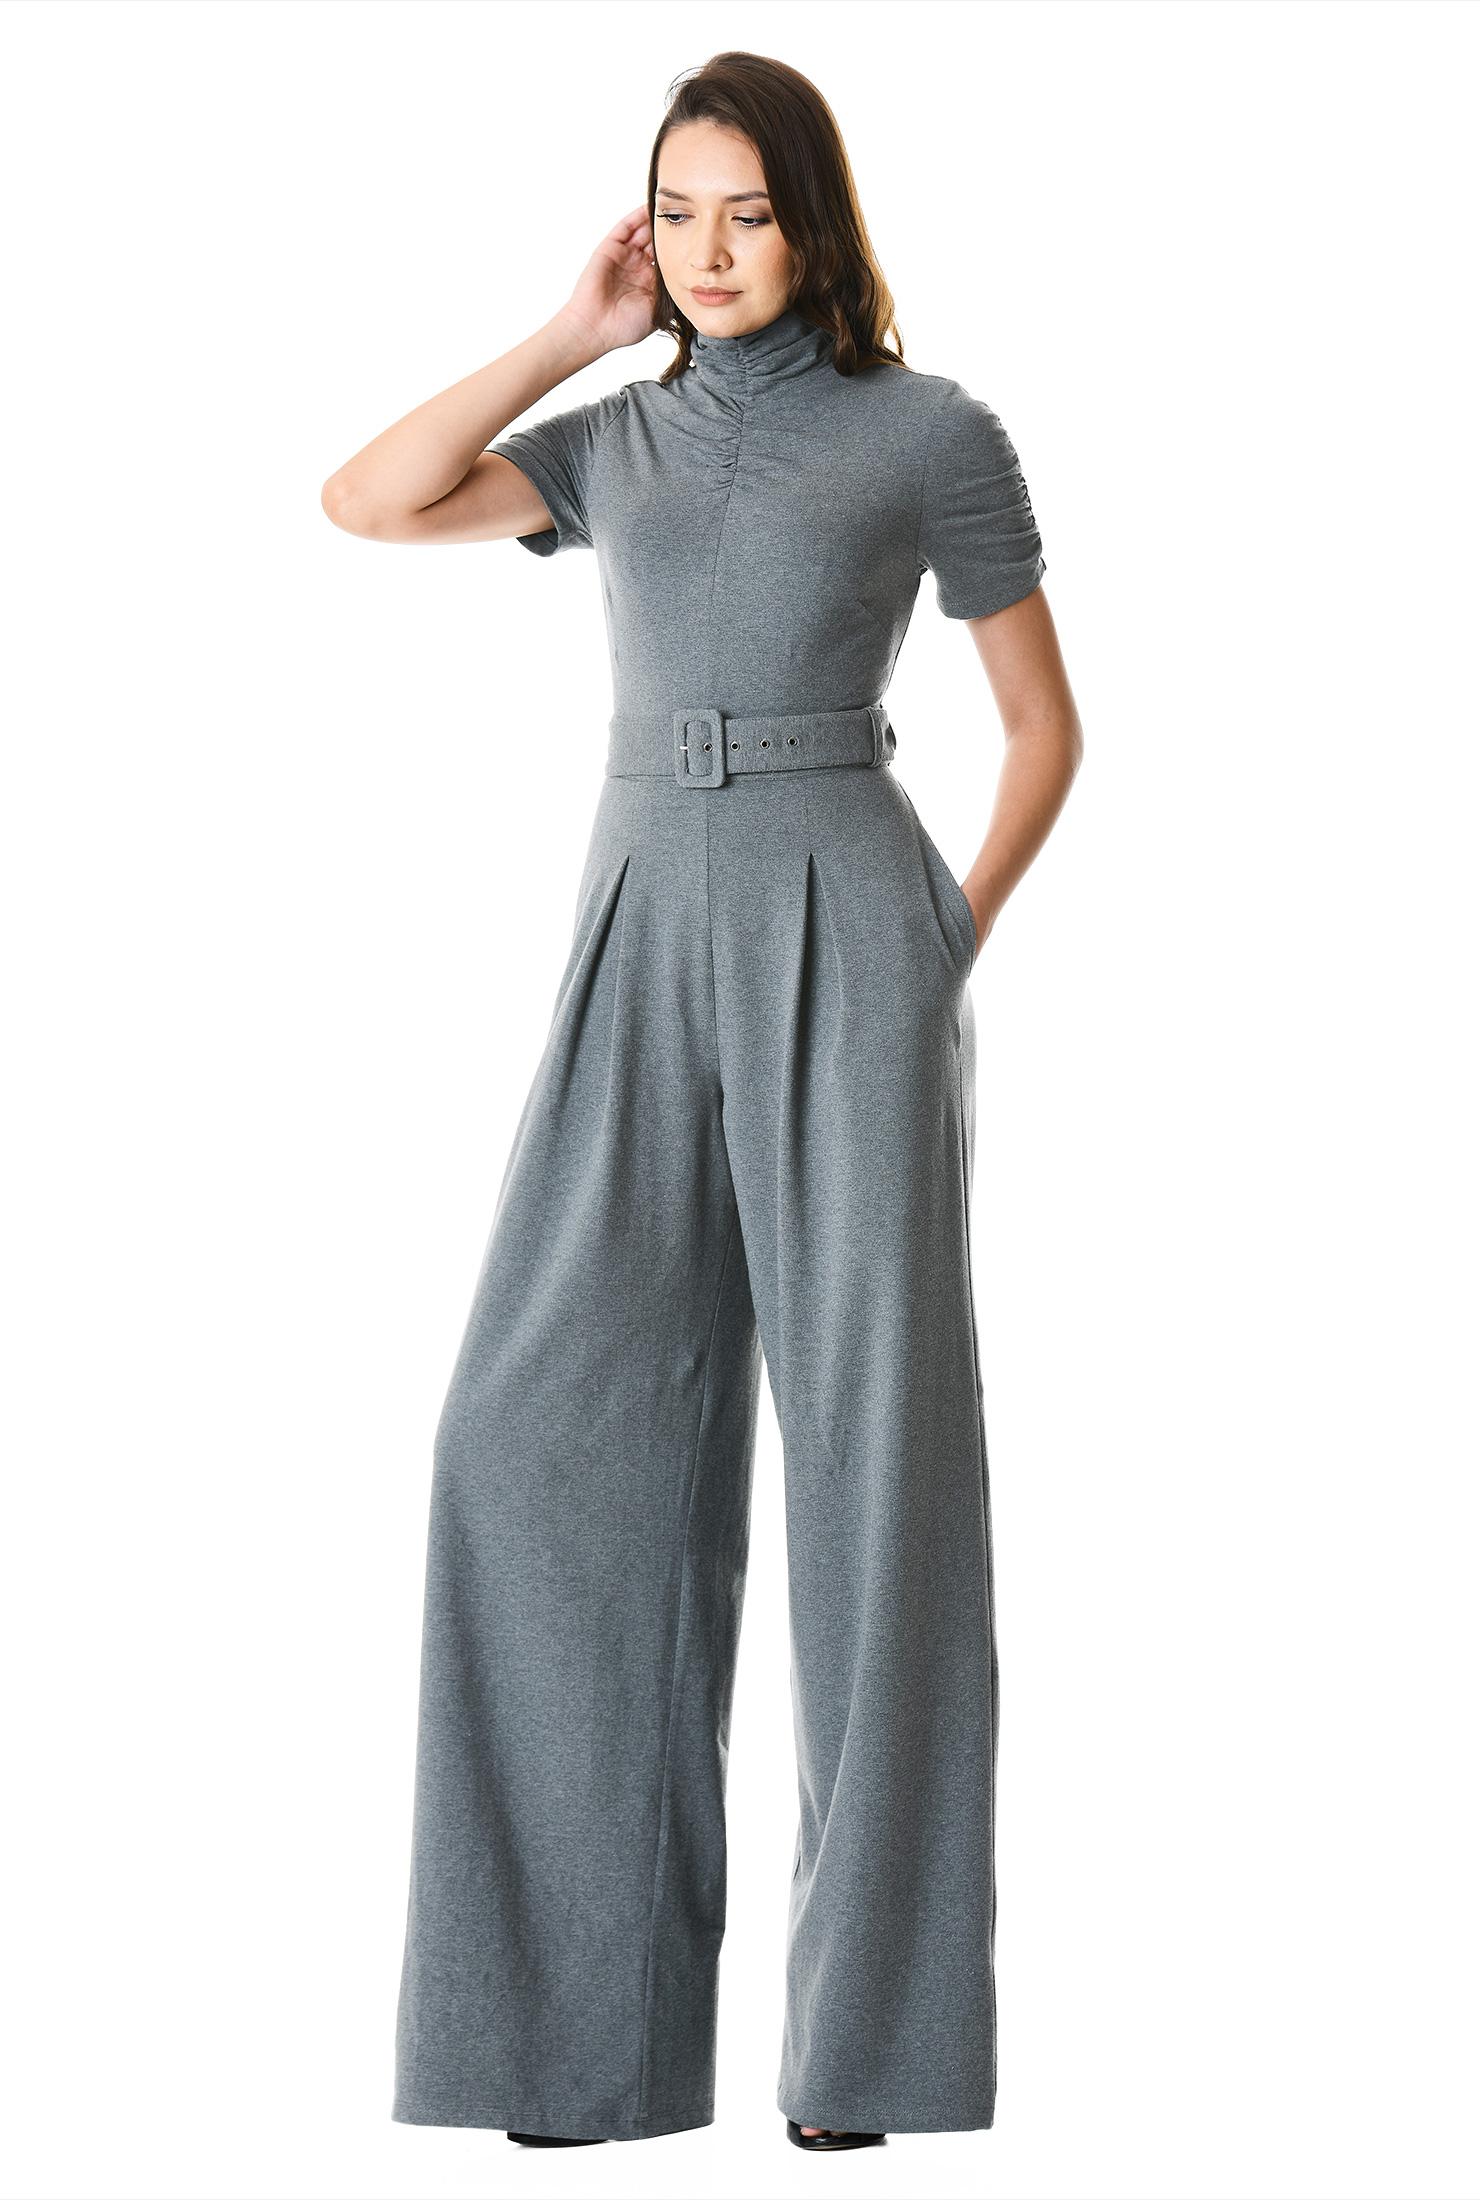 156f9a5613e Women s Fashion Clothing 0-36W and Custom